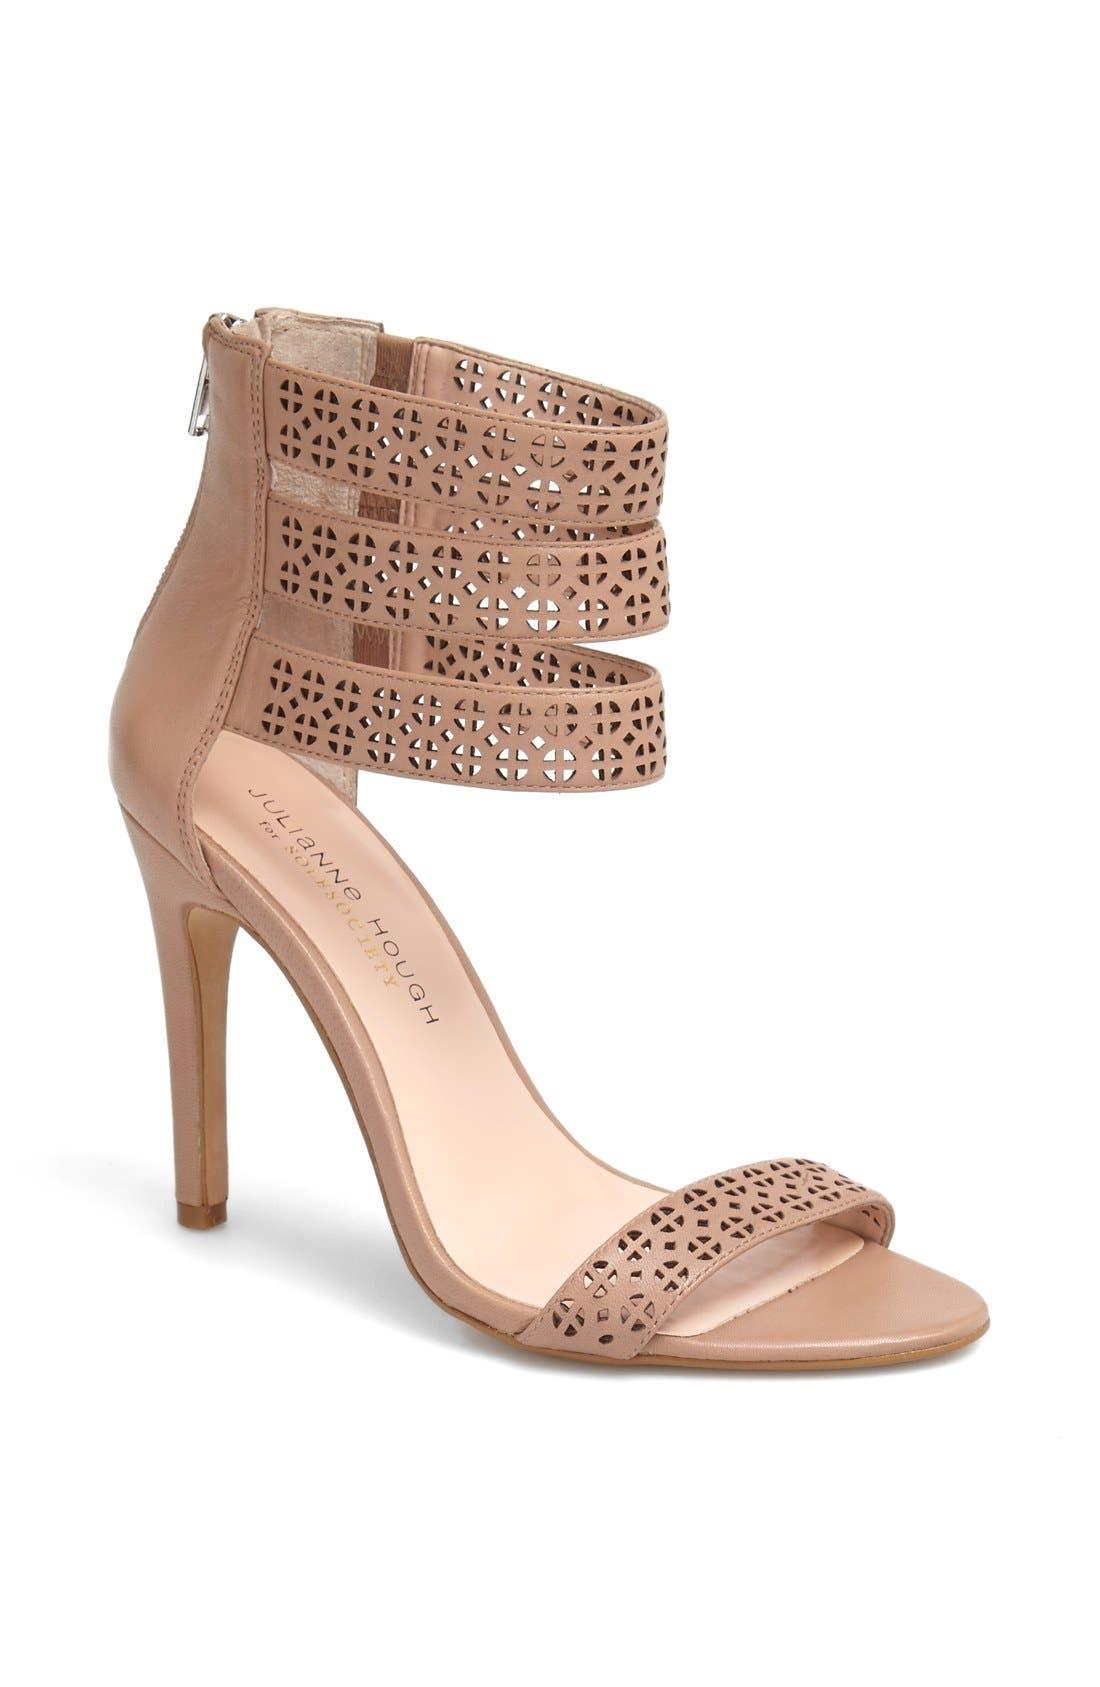 Alternate Image 1 Selected - Sole Society 'Abina' Sandal